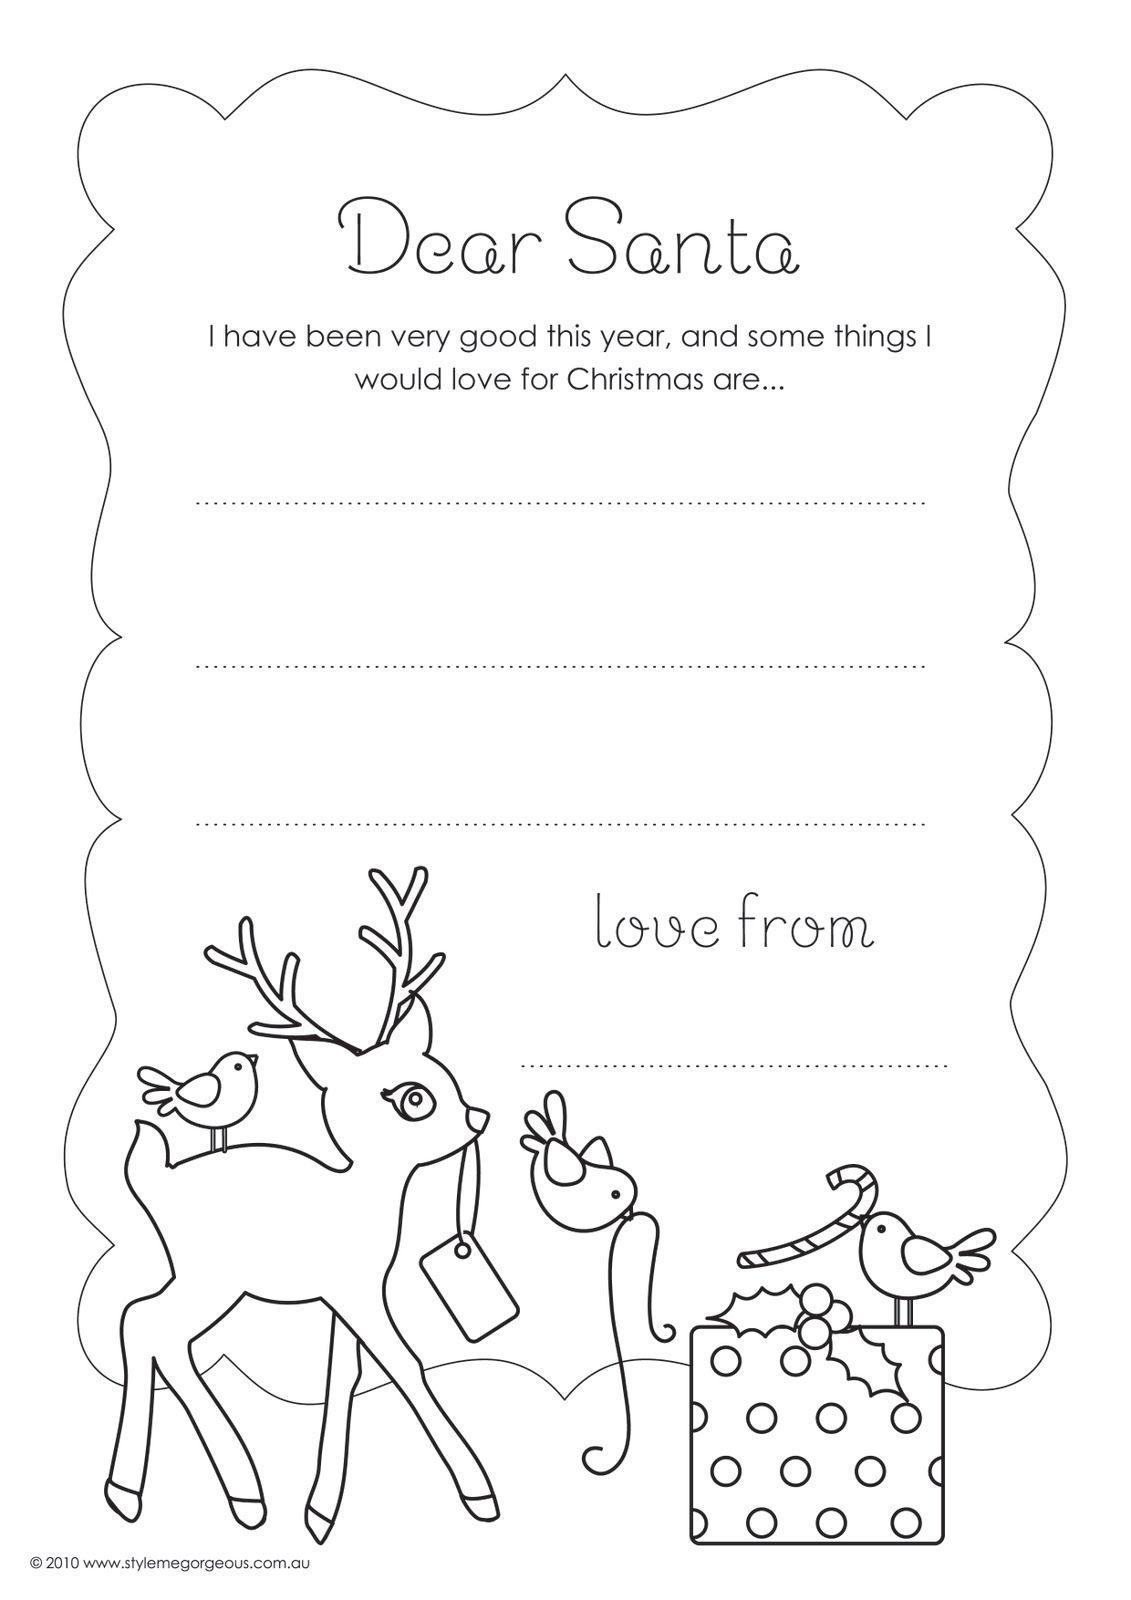 Dear Santa Letter Template for Kindergarten Style Me